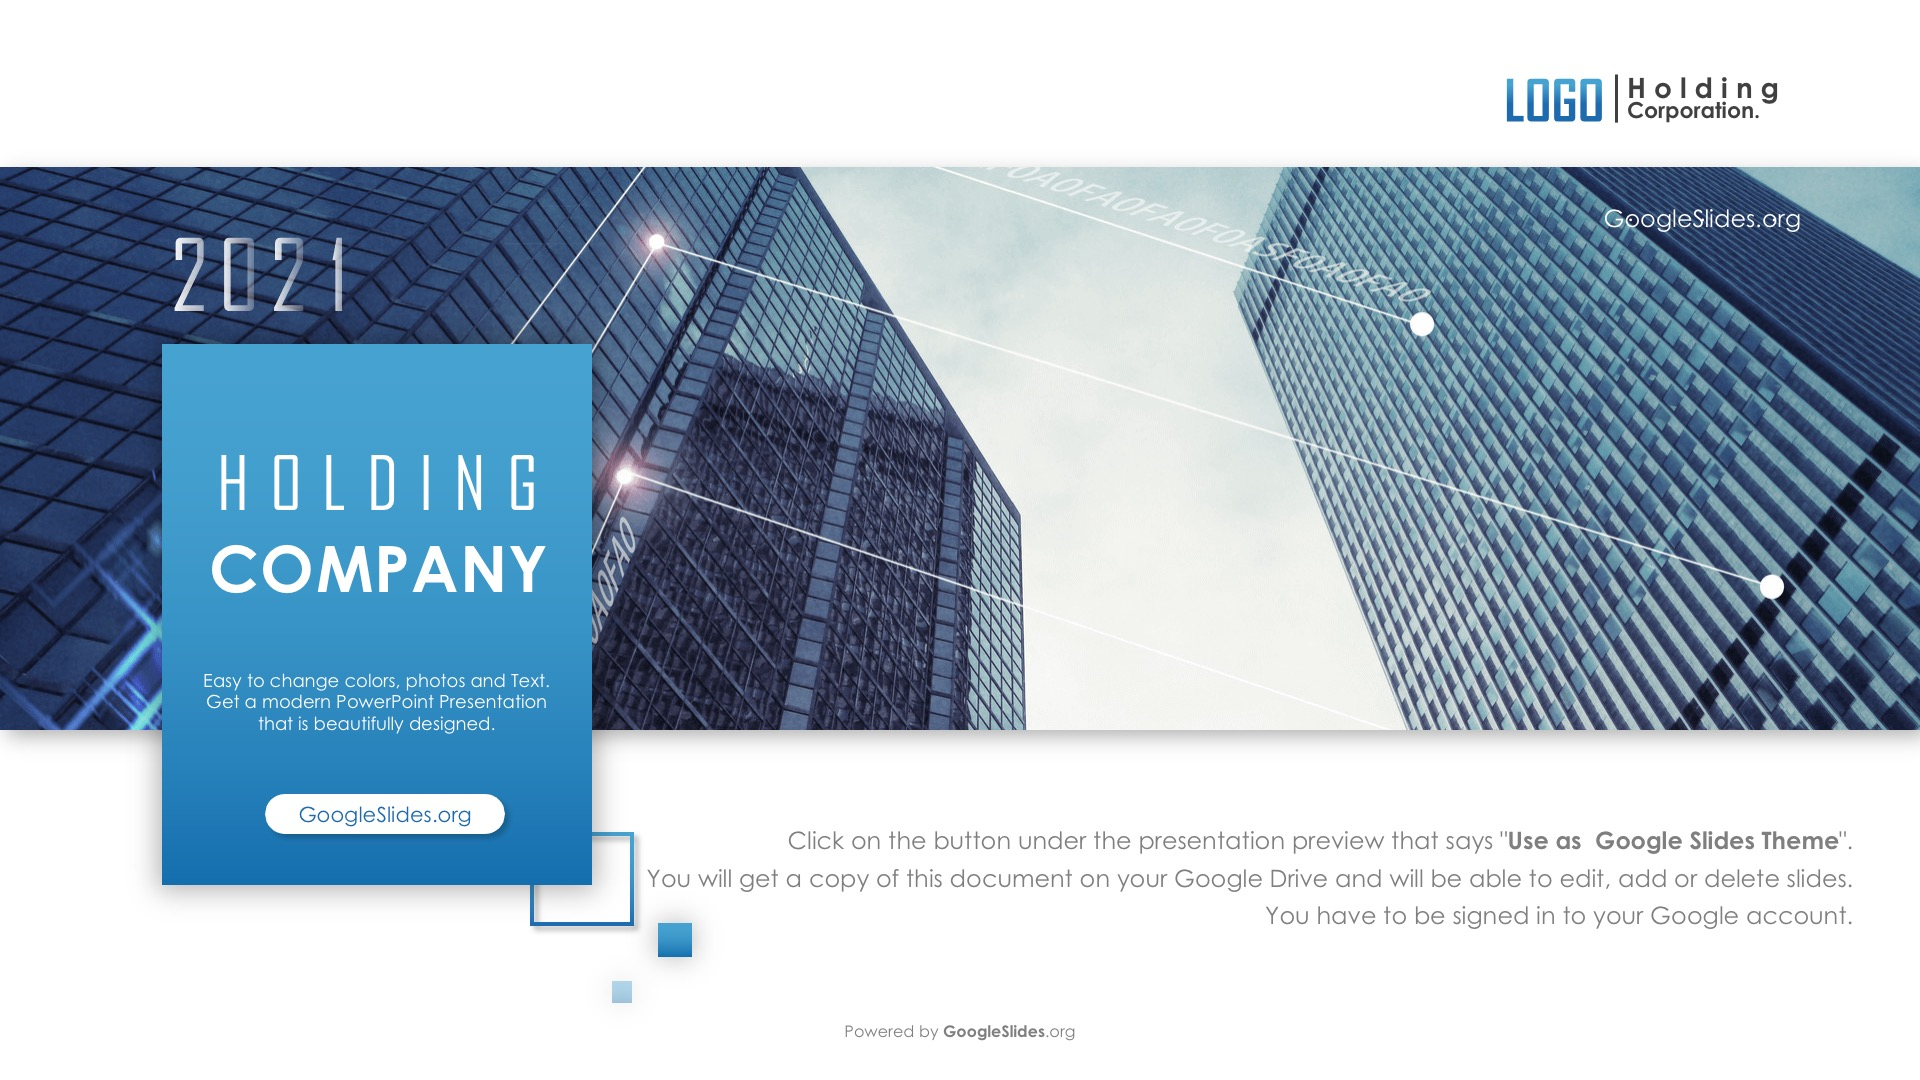 Holding Company Google Slides